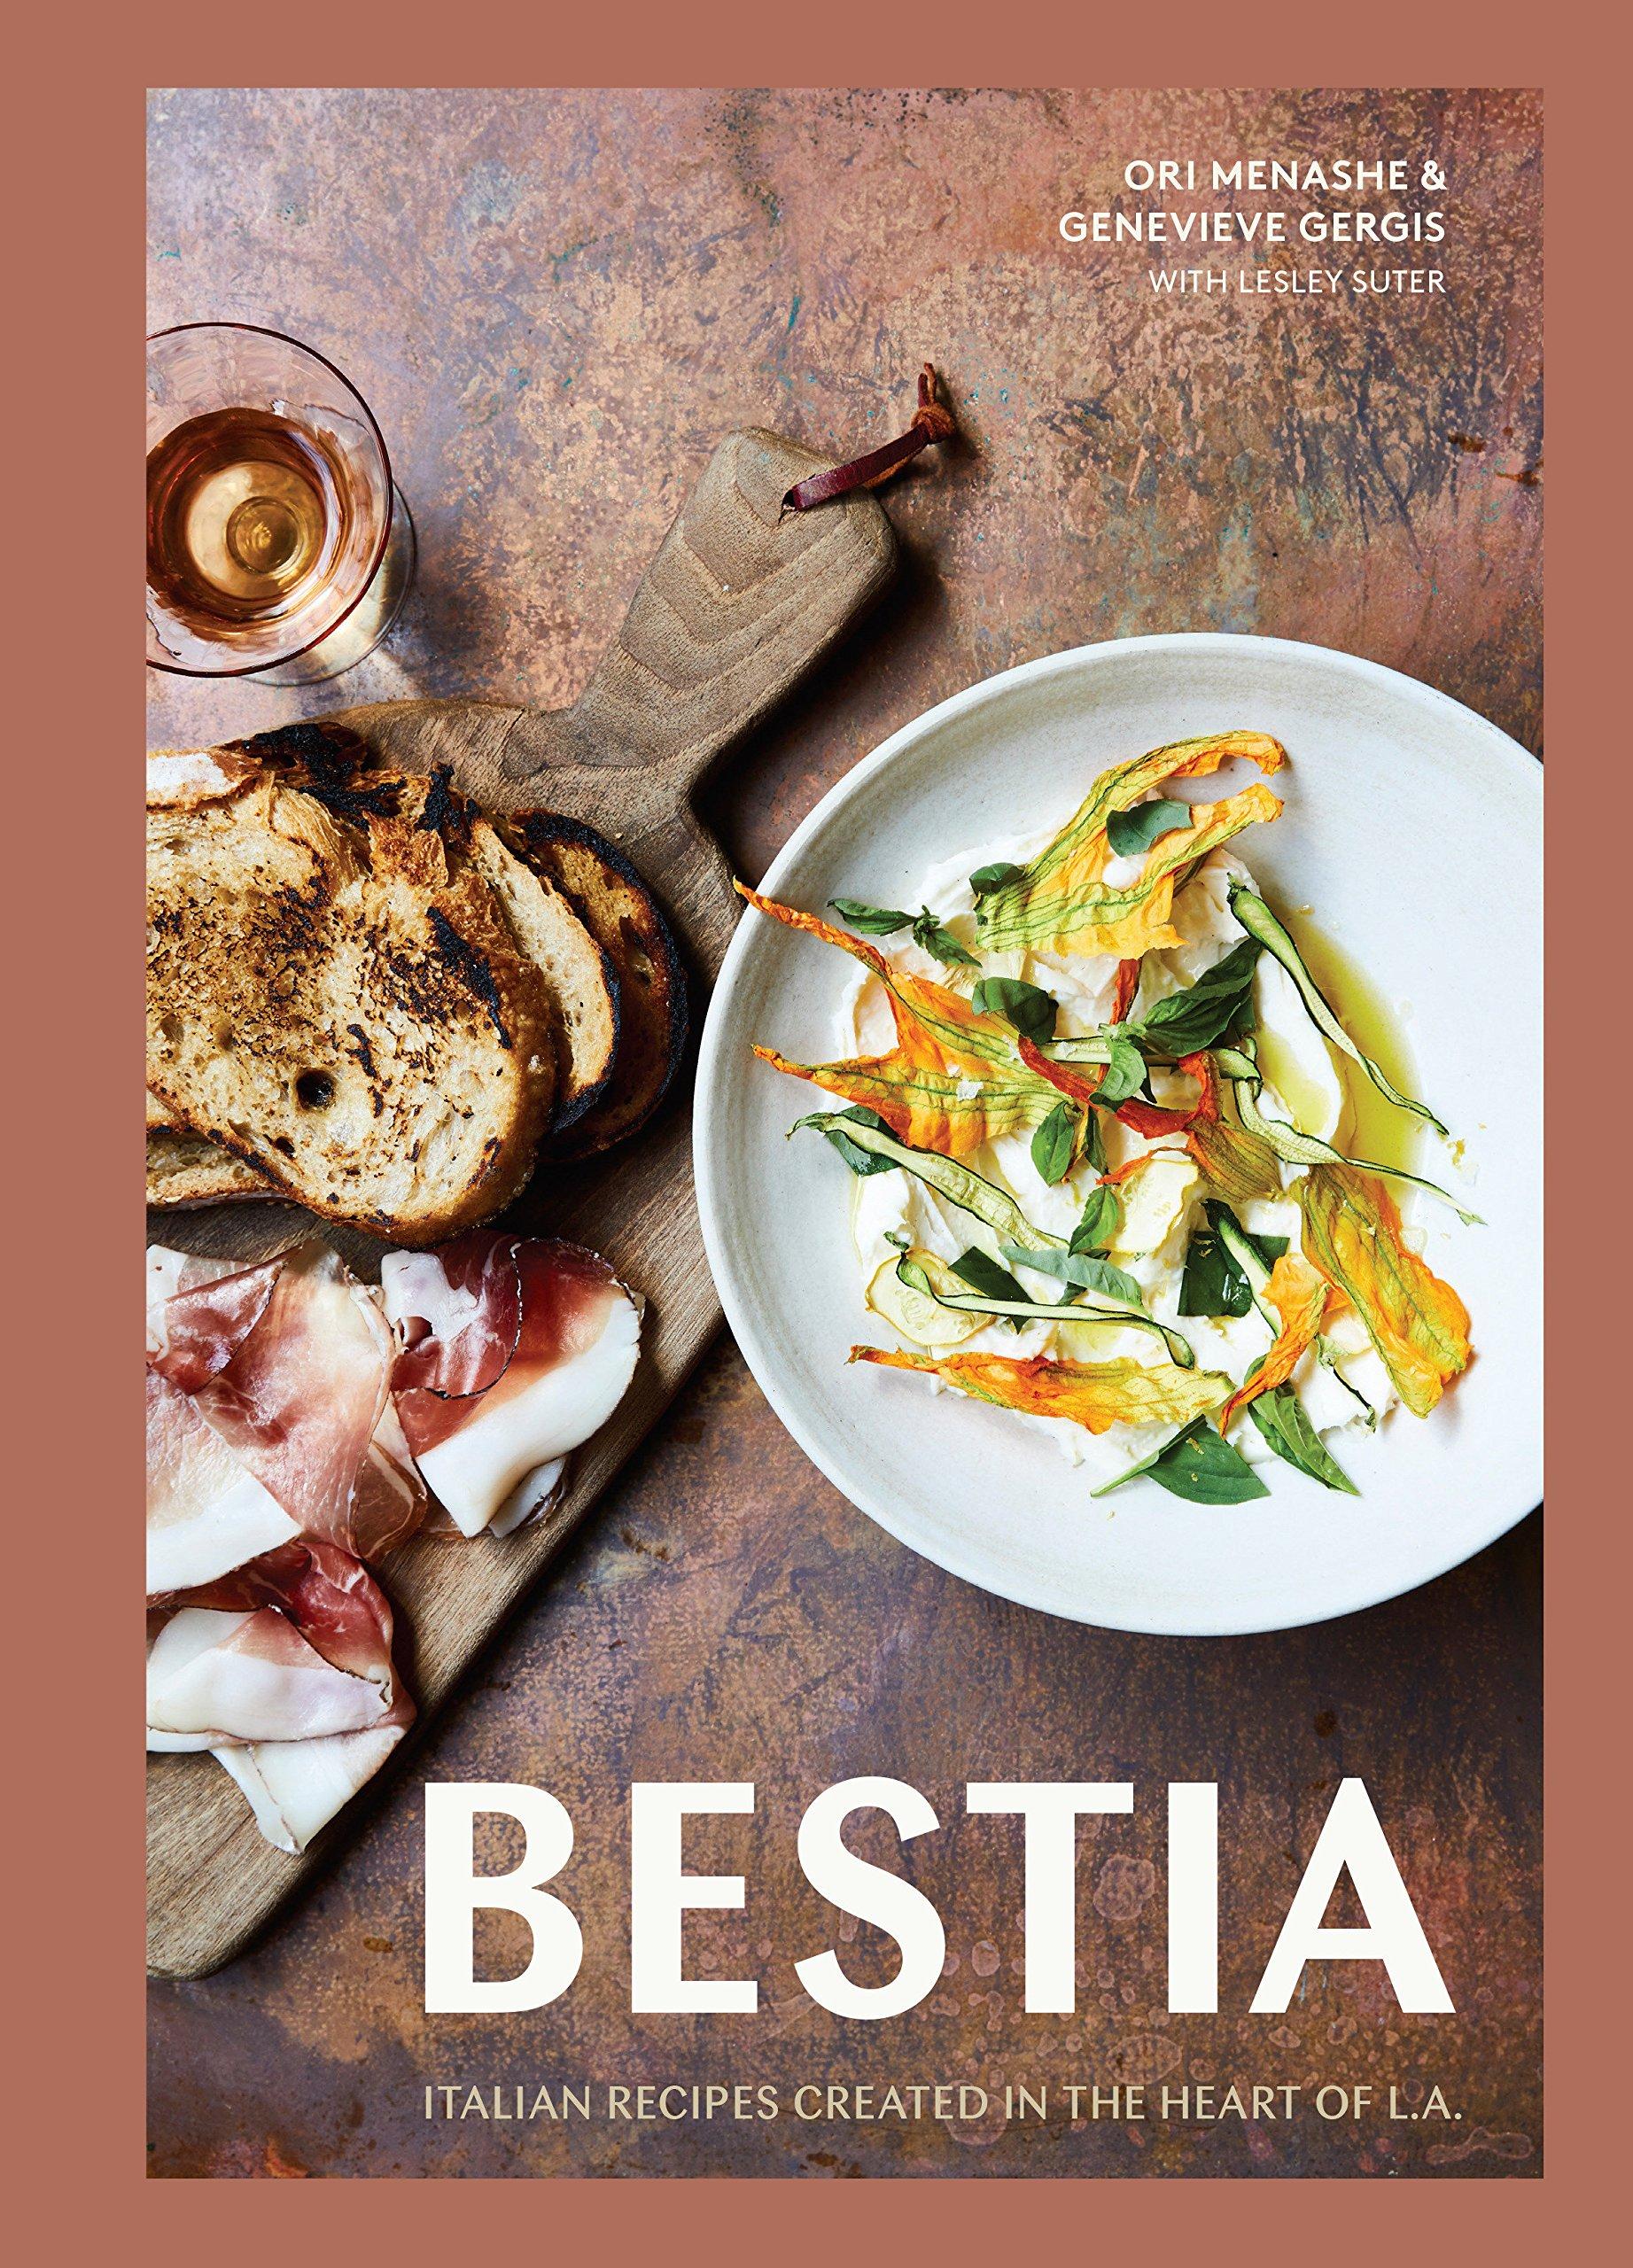 bestia italian recipes created in the heart of l a ori menashe